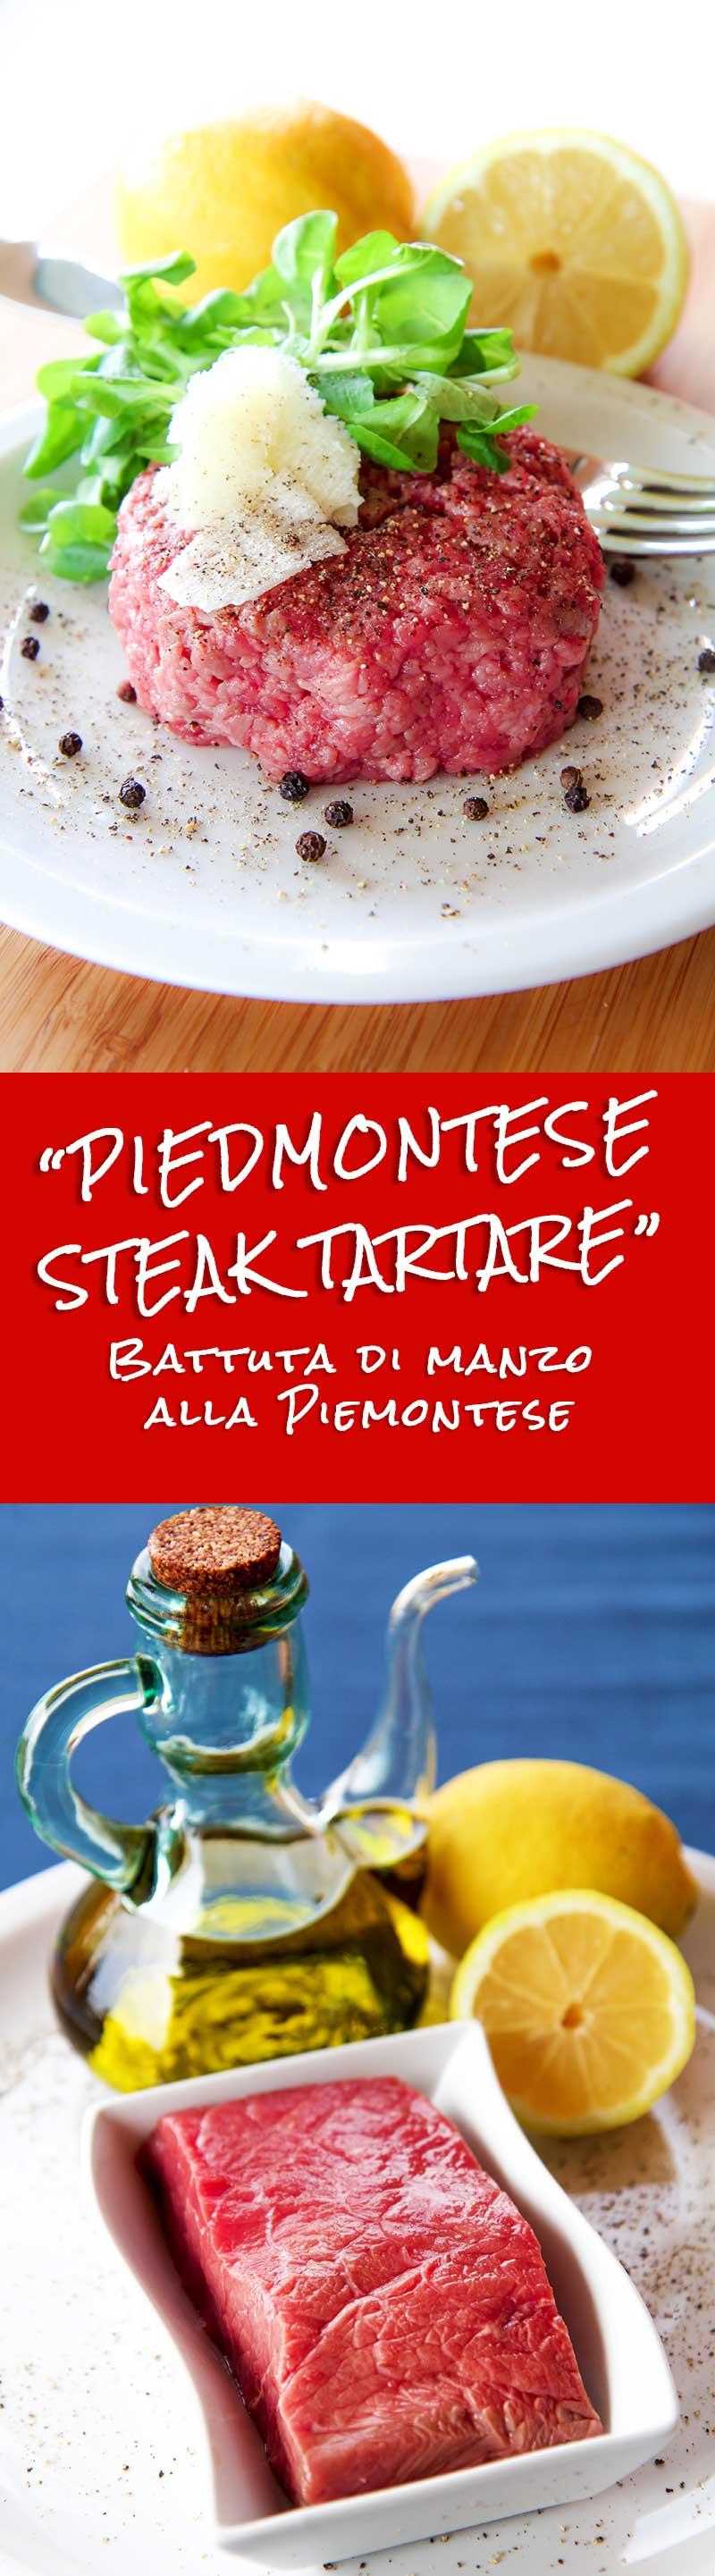 PIEDMONTESE BEEF STEAK TARTARE (Battuta di Manzo alla Piemontese)